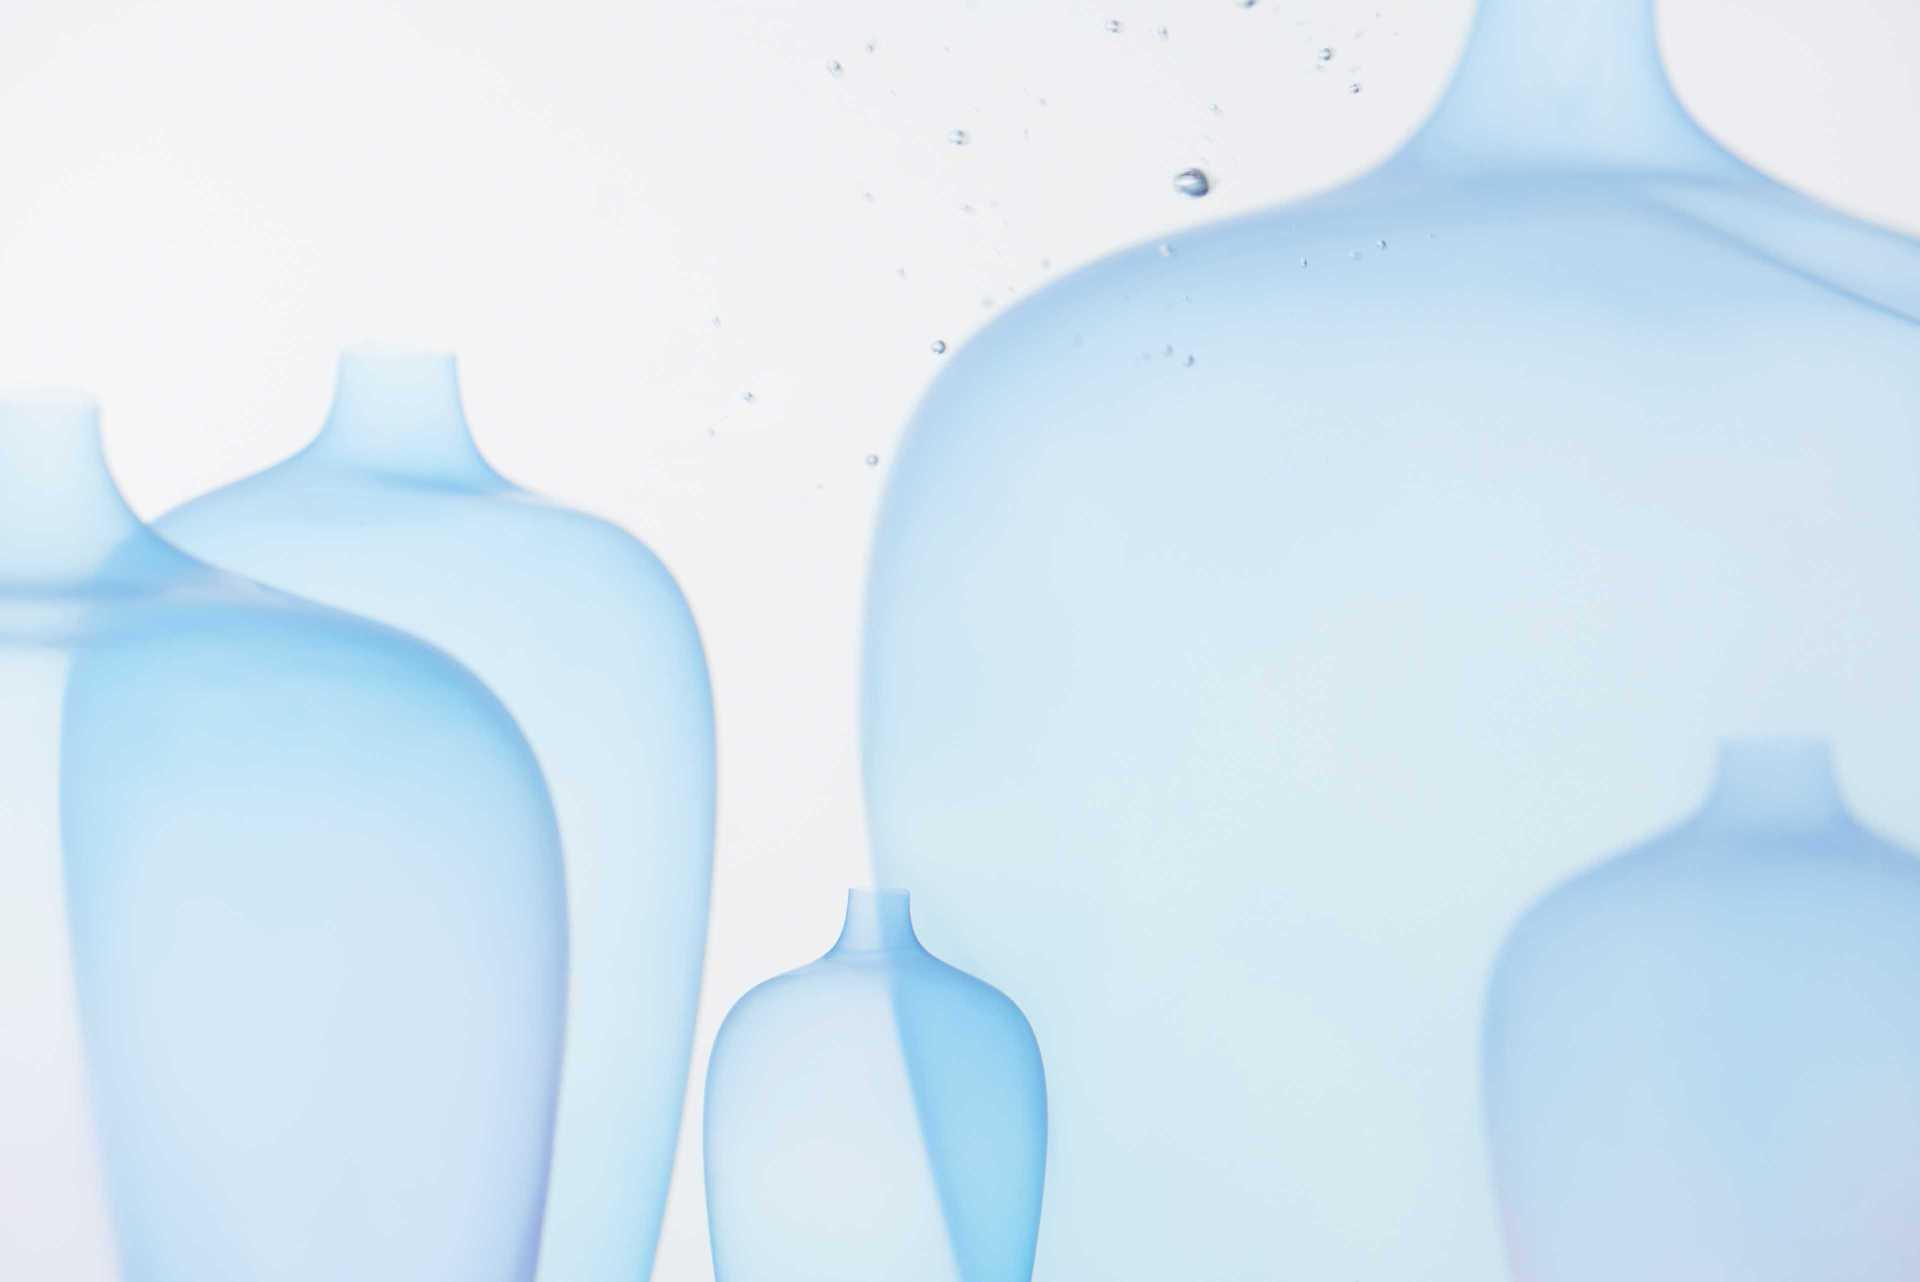 Nendo: Jellyfish Vase  - jellyfish vase14 akihiro yoshida 34